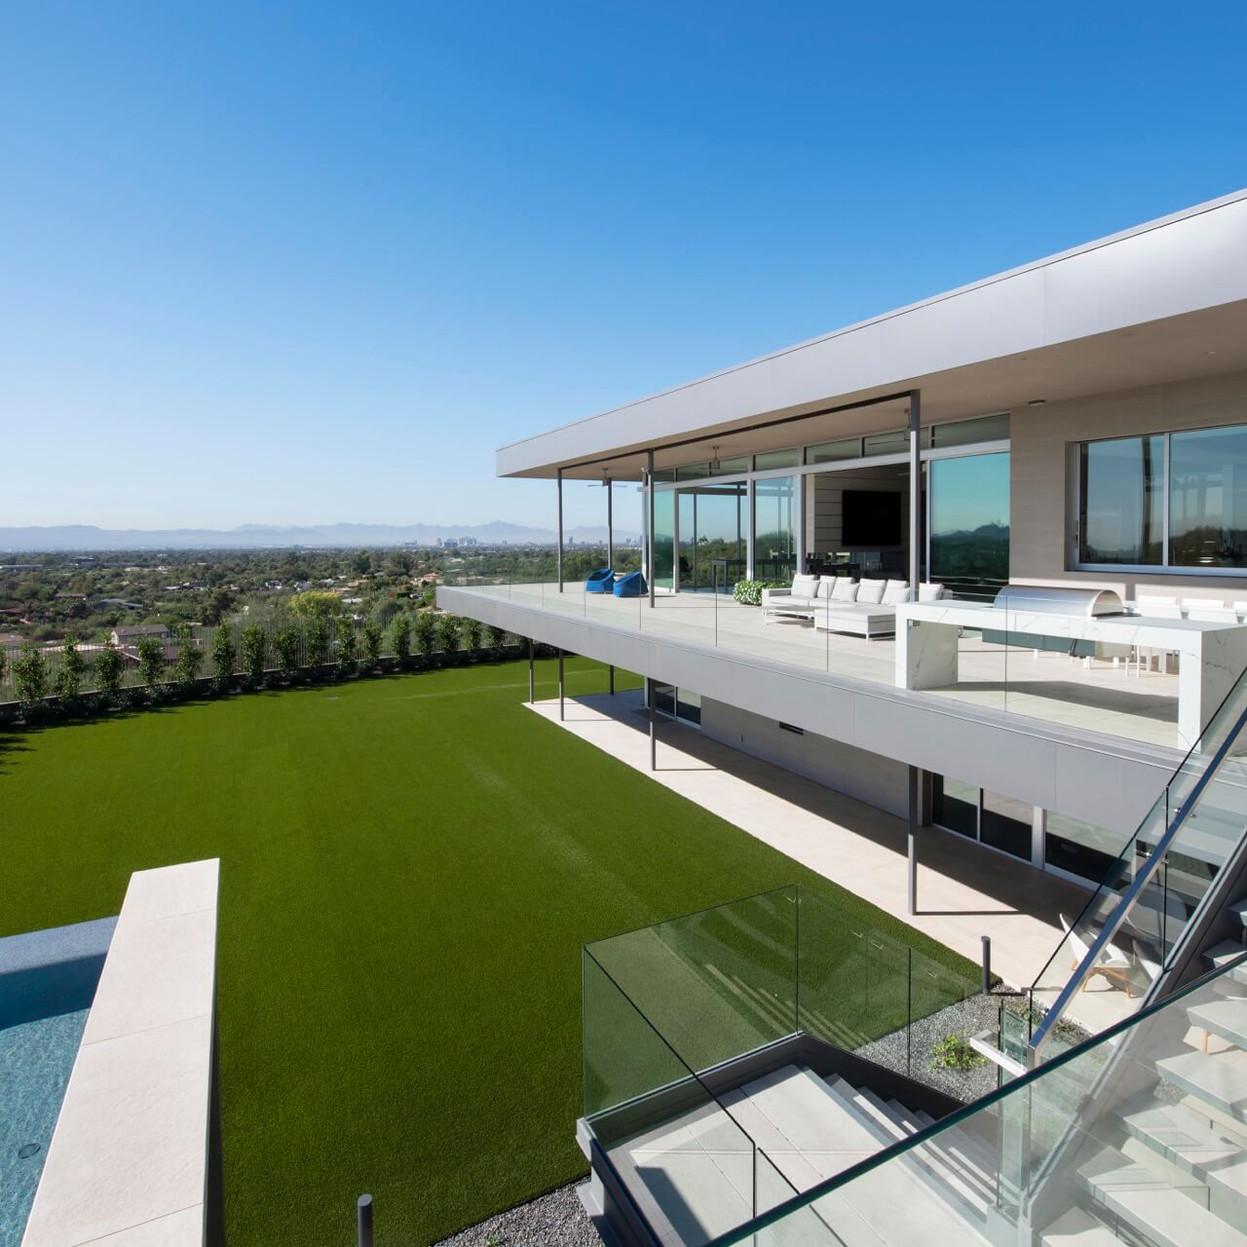 The Hogan | Paradise Valley, AZ (designed at PHX Architecture)